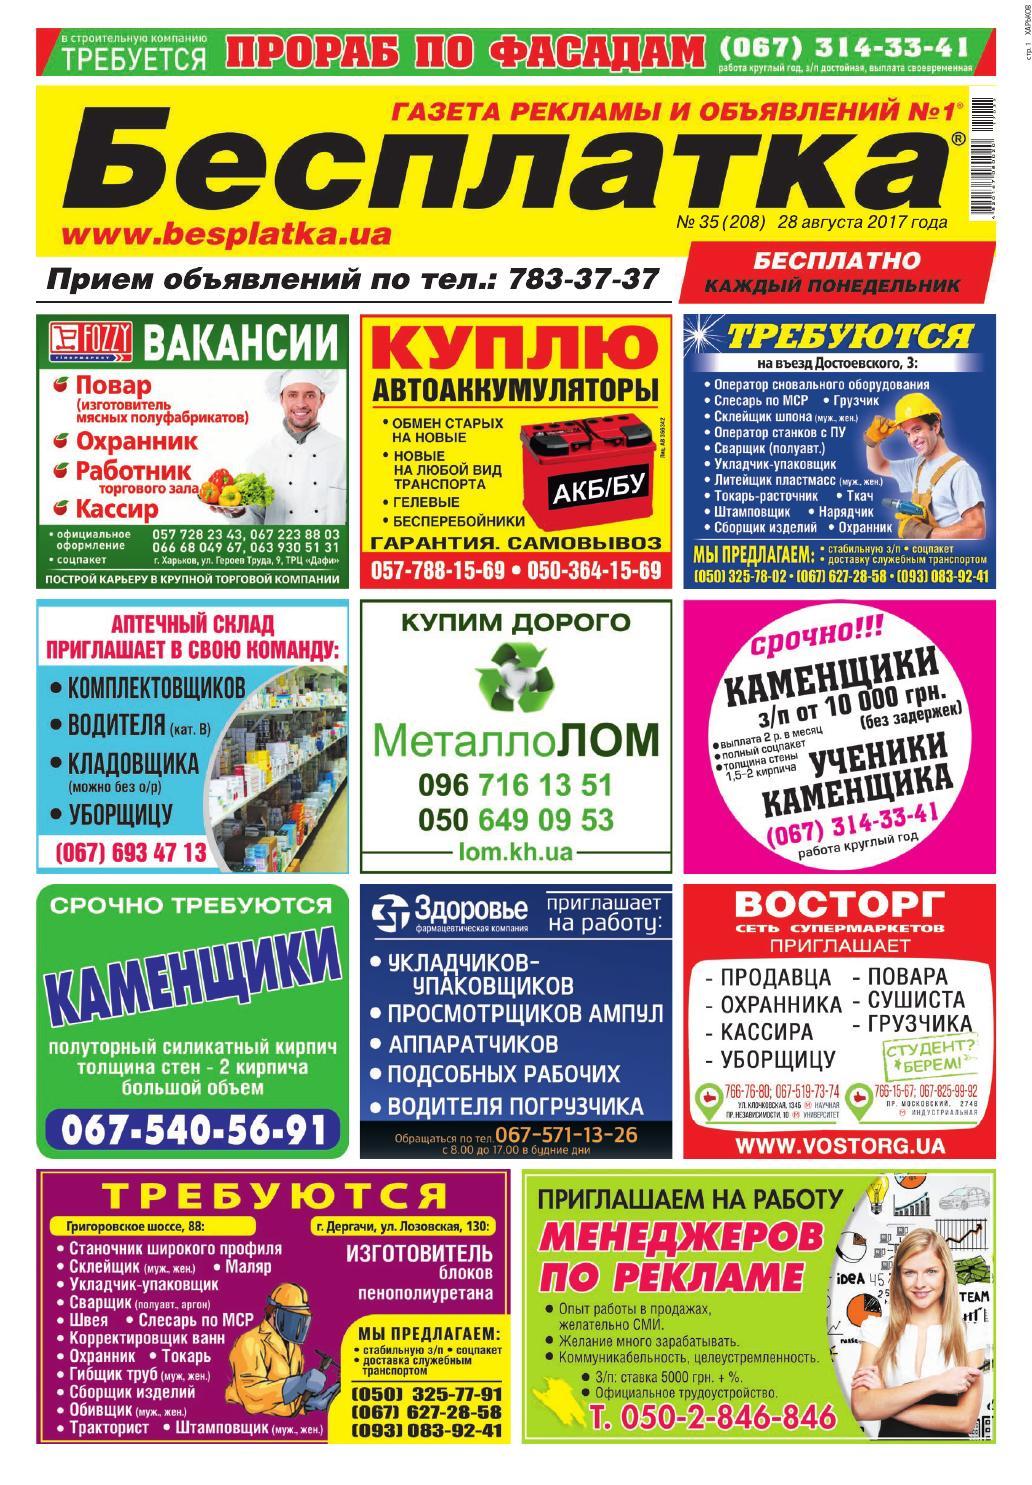 39f789ce Besplatka #35 Харьков by besplatka ukraine - issuu